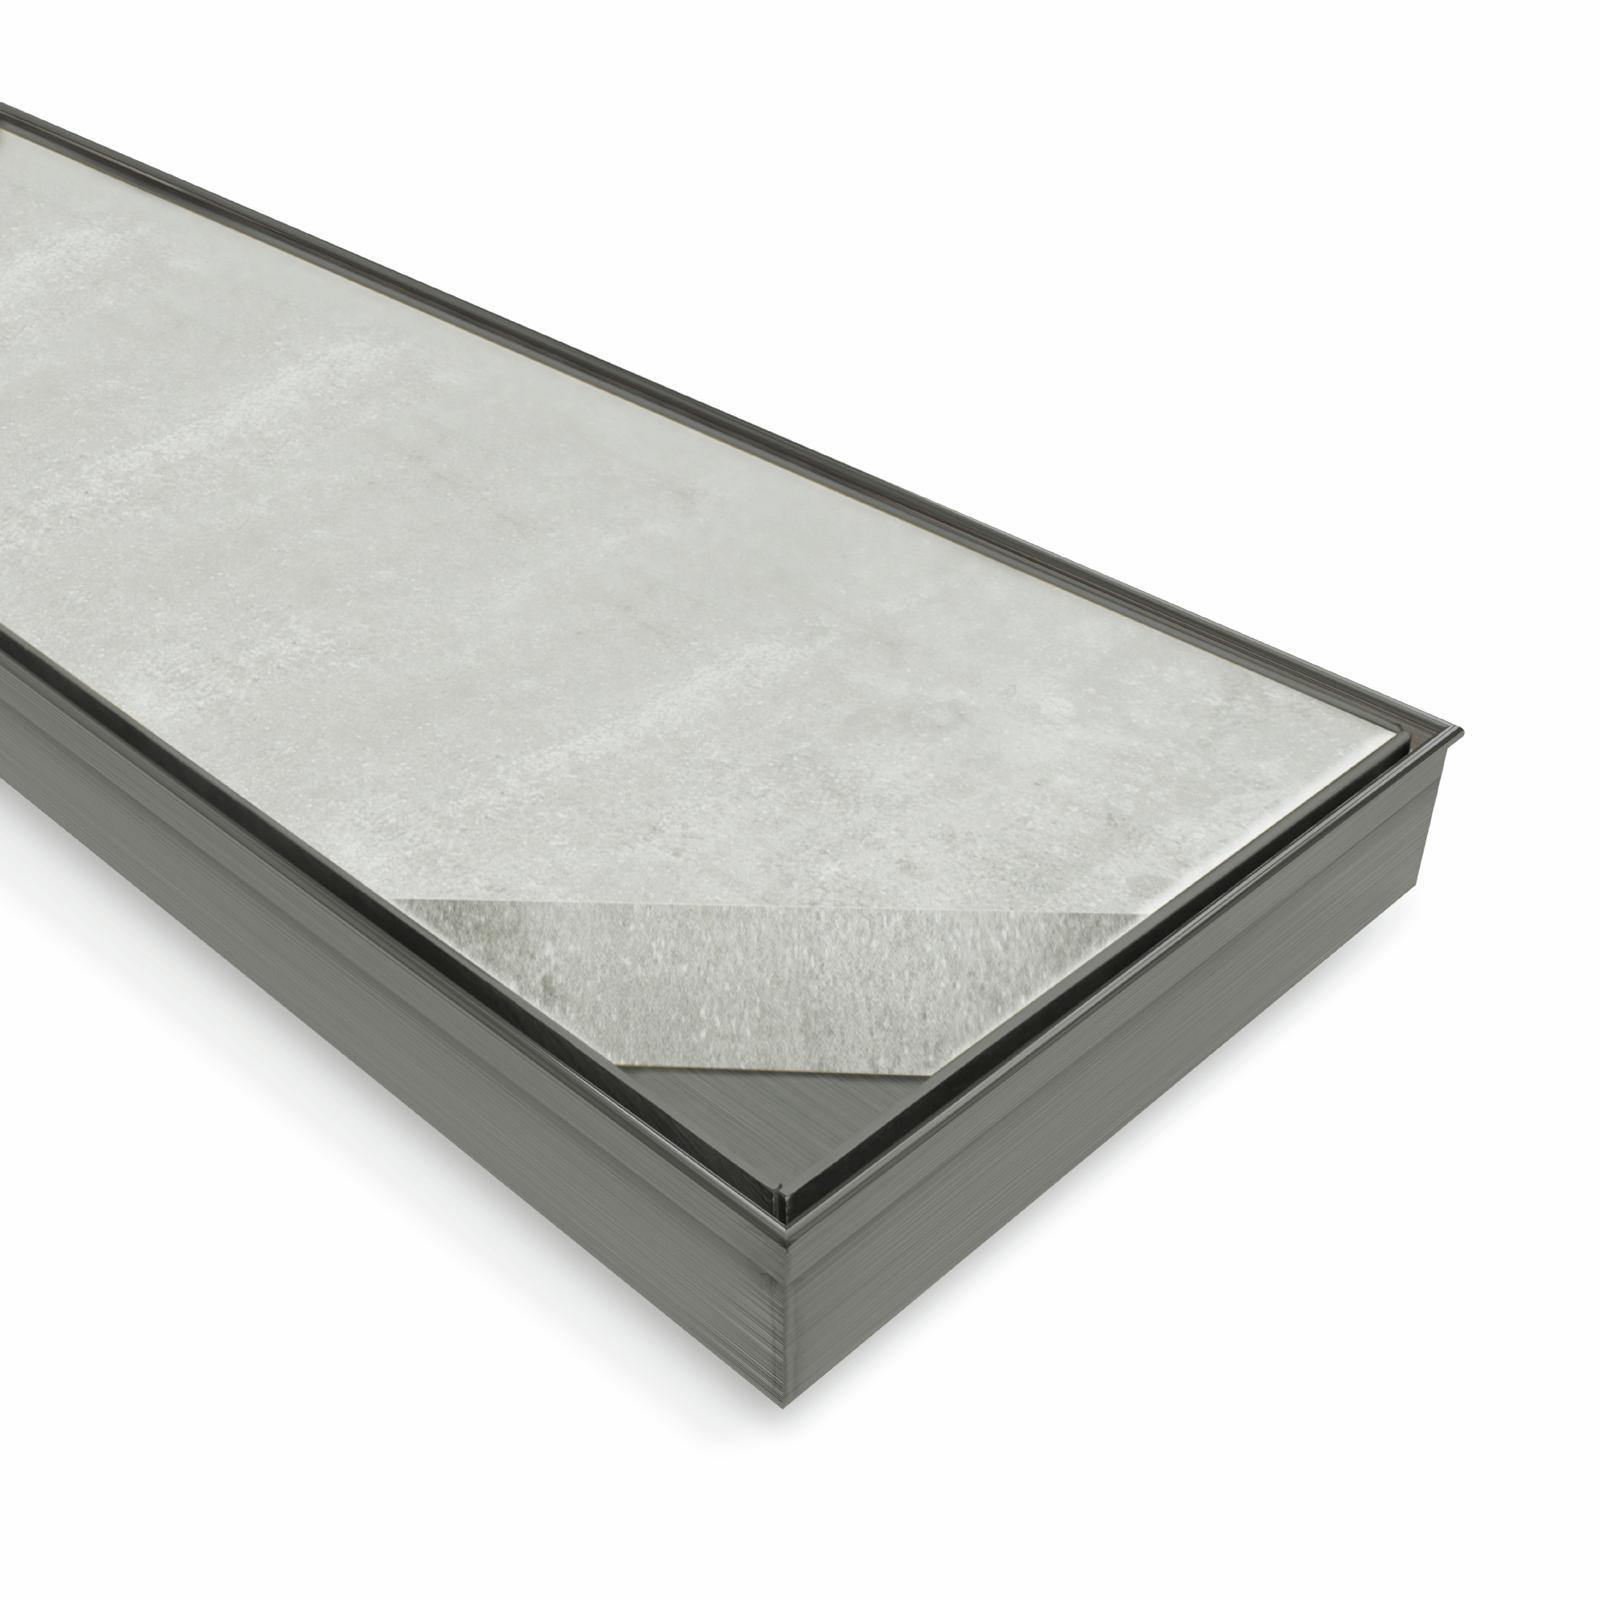 Forme 1200 × 100mm Brushed Gun Metal Grey PVD Stainless Steel Tile Insert Floor Waste